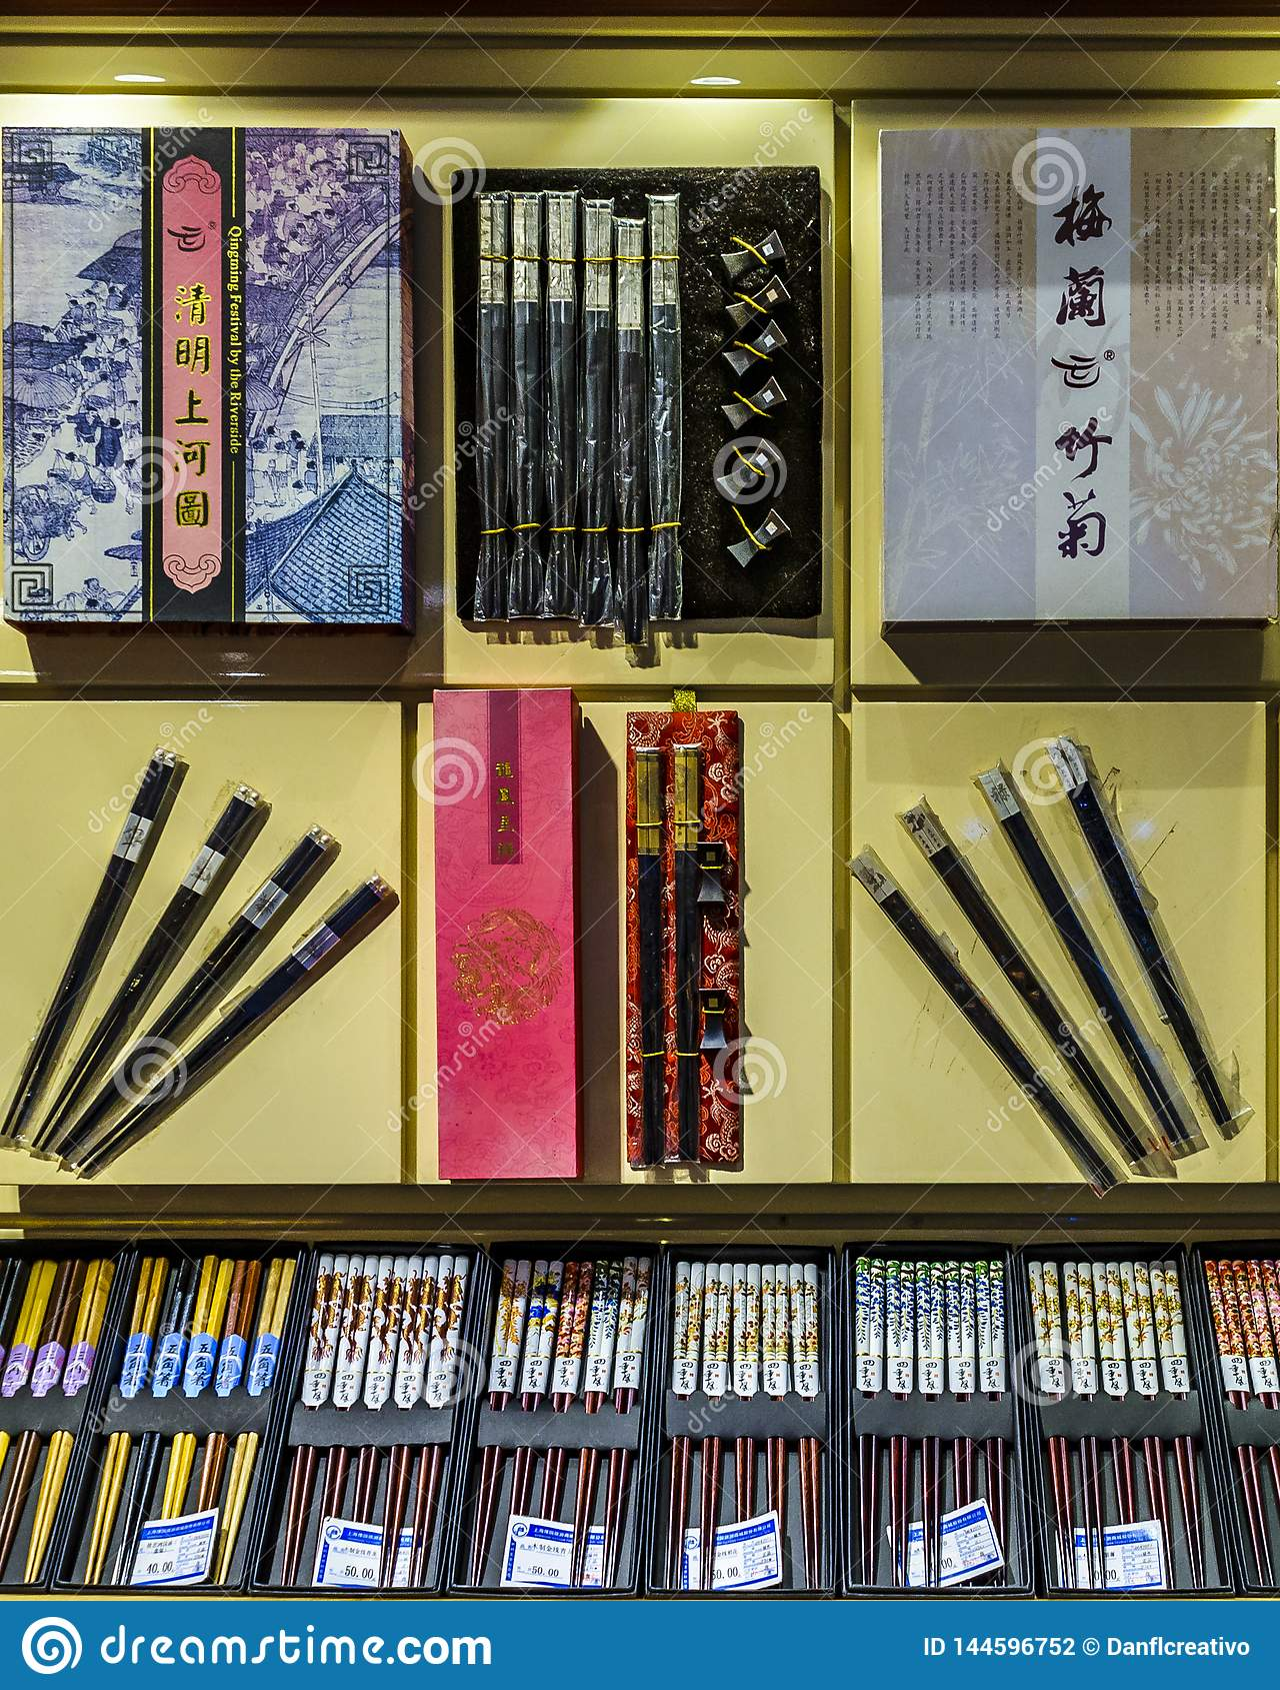 Chopsticks κατάστημα, Σαγκάη, Κίνα